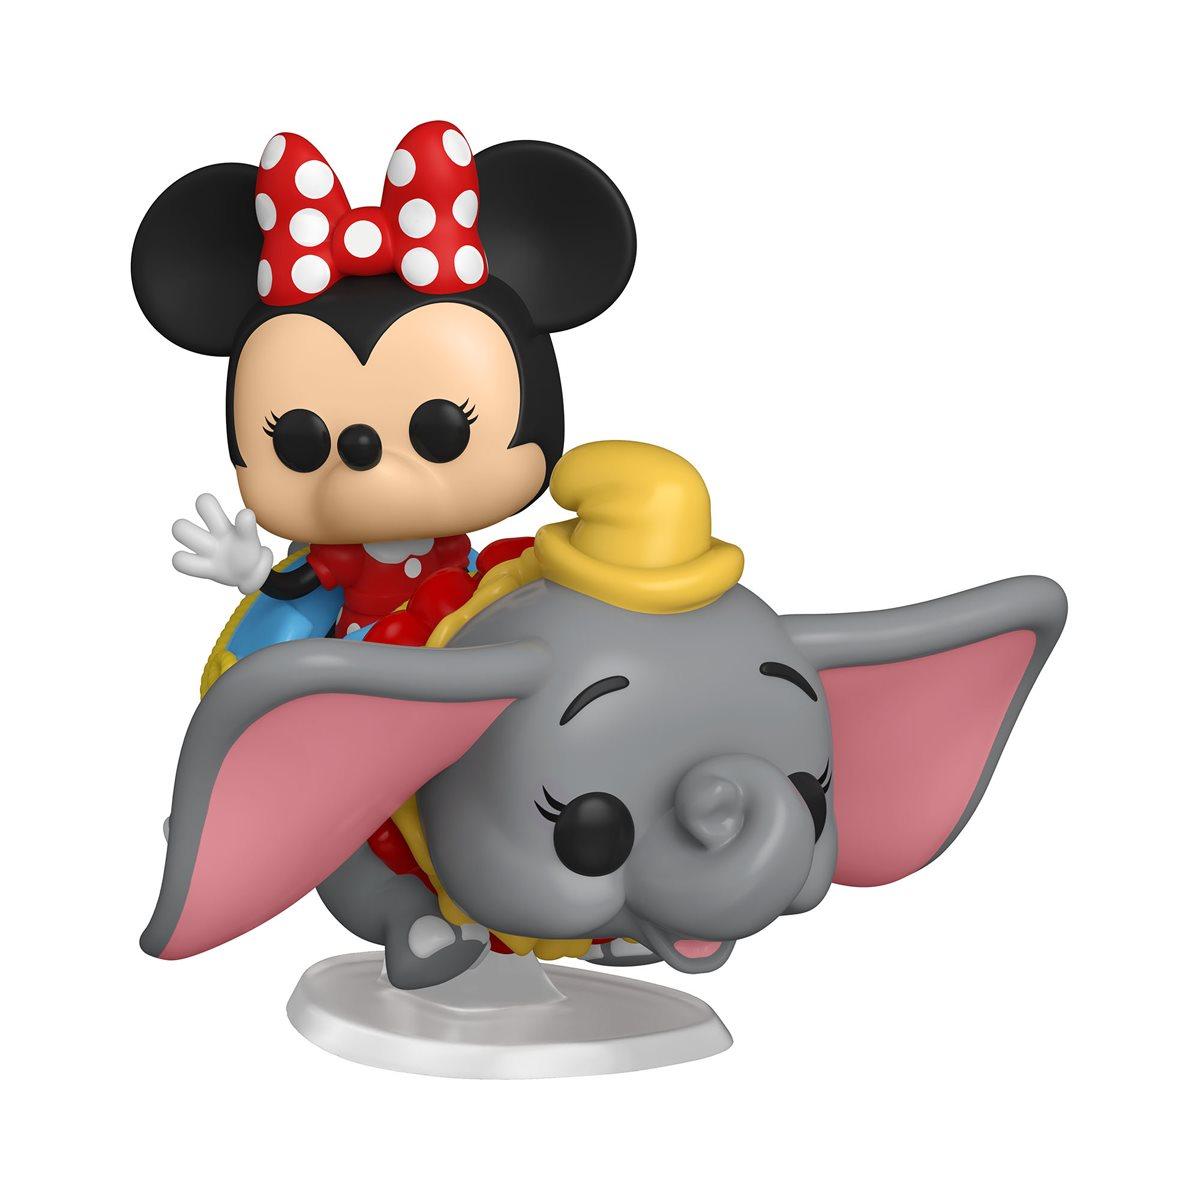 Funko Pop! Minnie Mouse no Dumbo the Flying Elephant Attraction: Aniversário de 65 anos da Disneylândia  - Funko